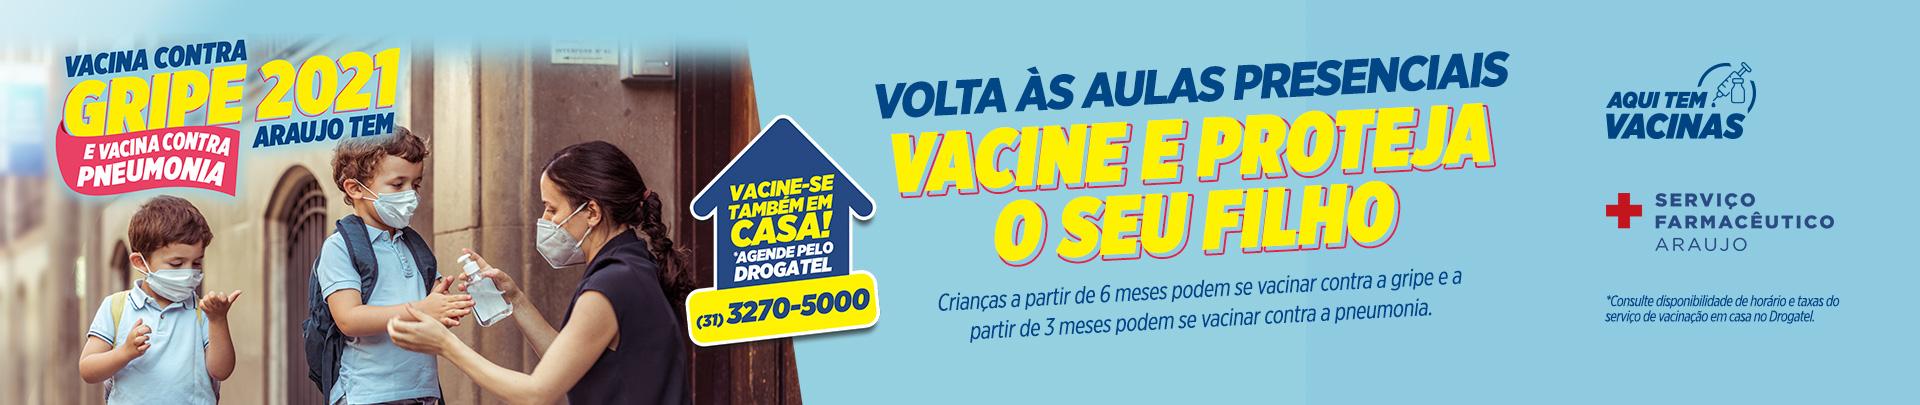 Vacina_Abril2021